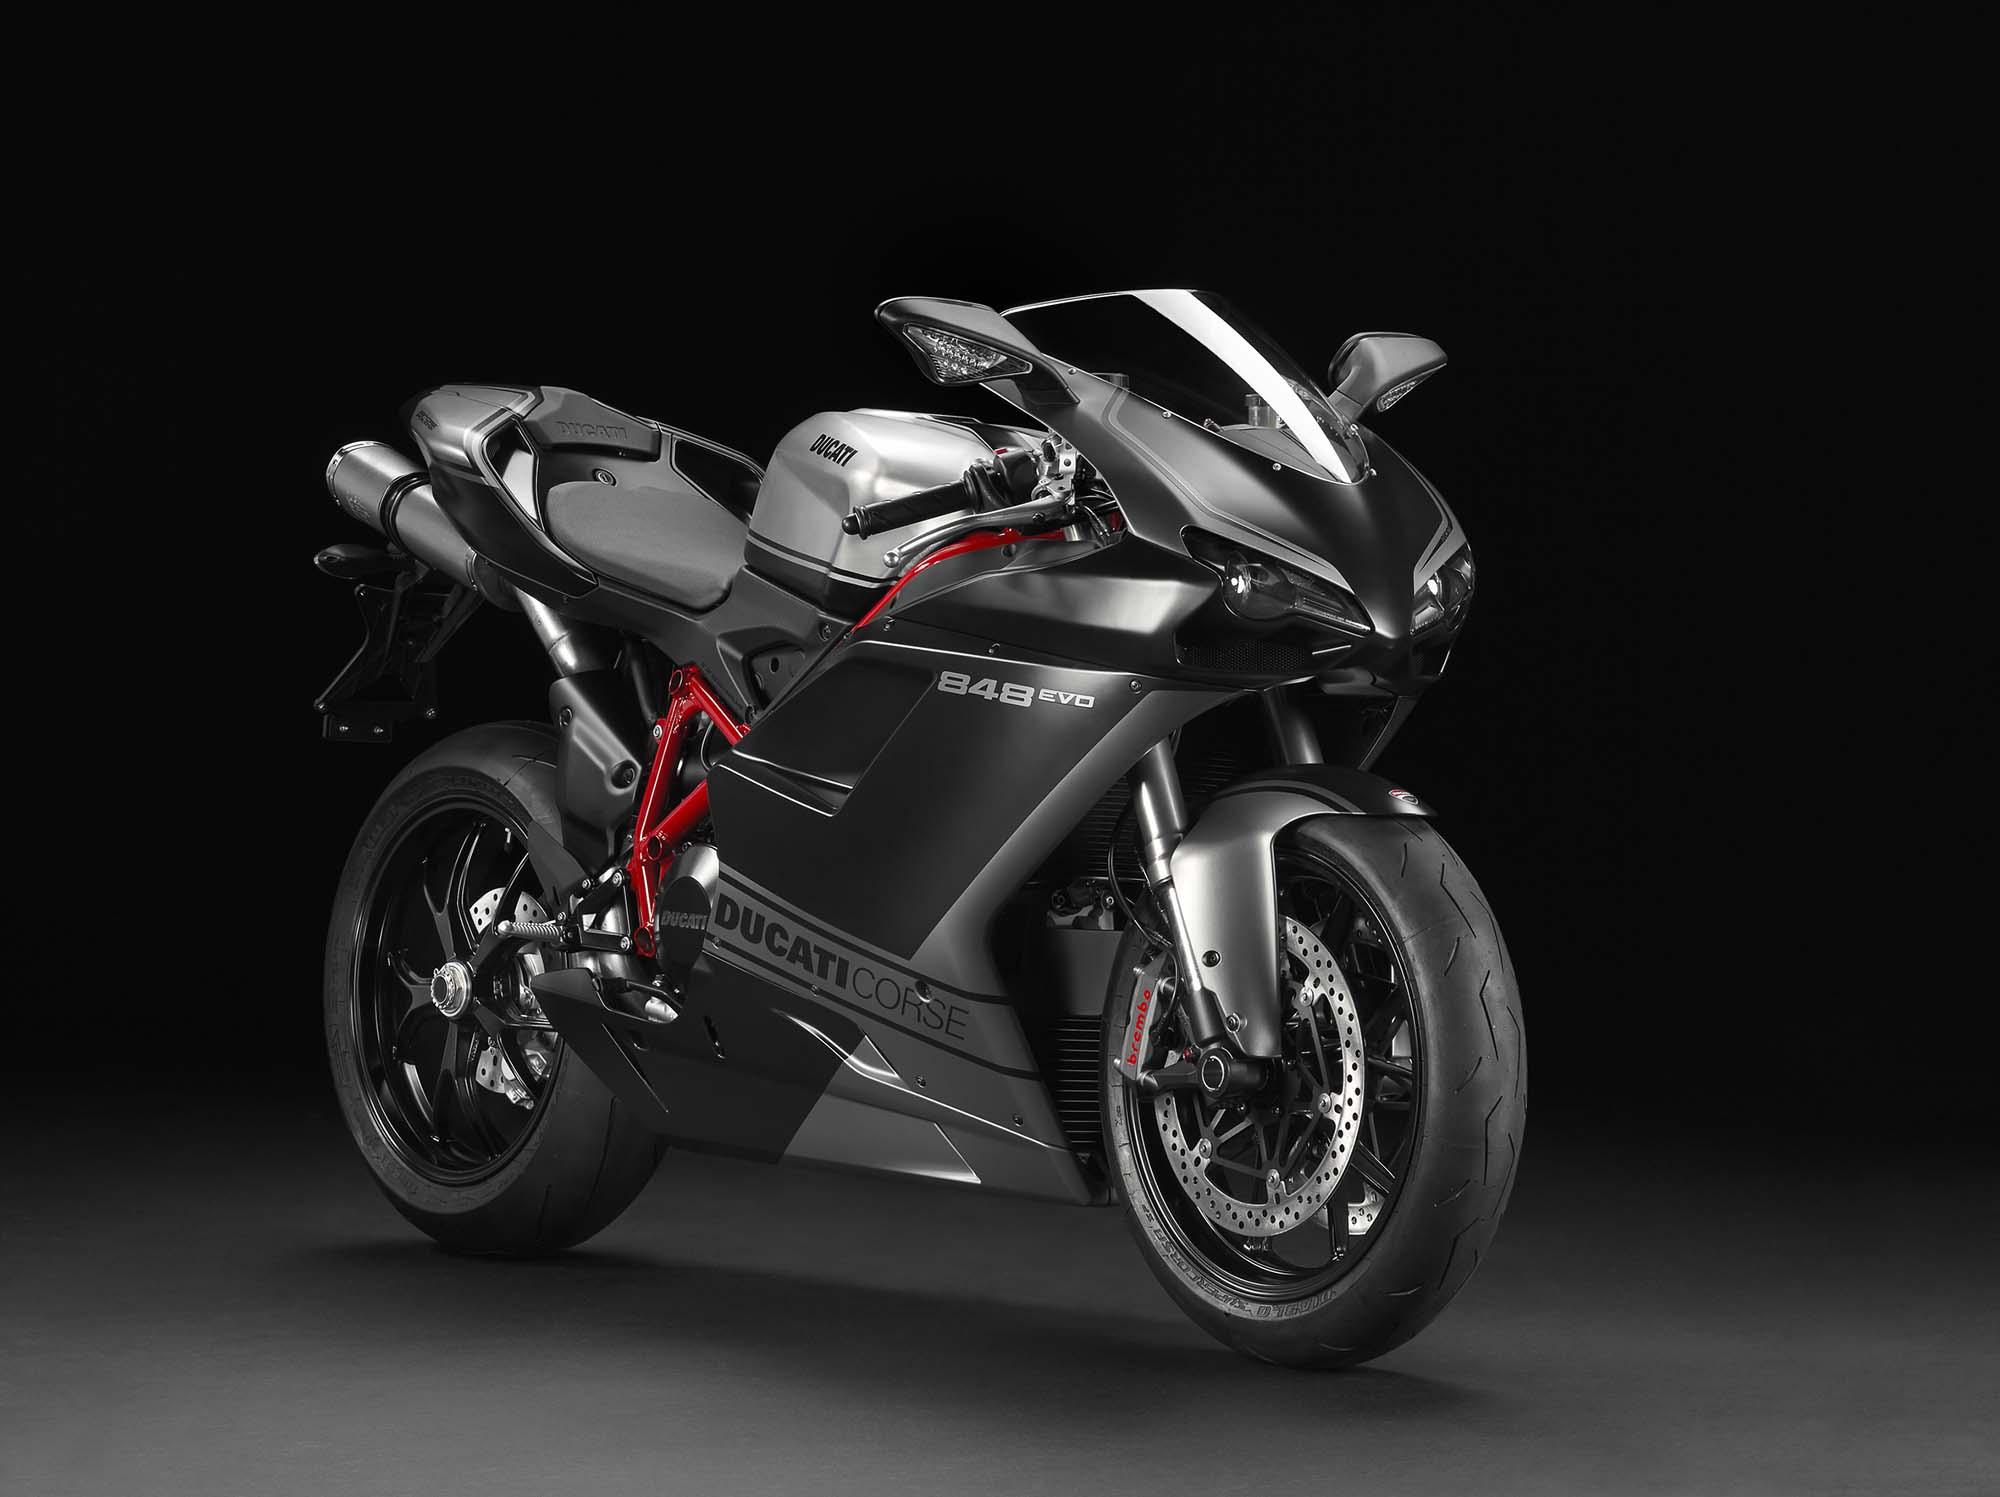 2013 Ducati Superbike 848 Evo Corse Se Asphalt Rubber